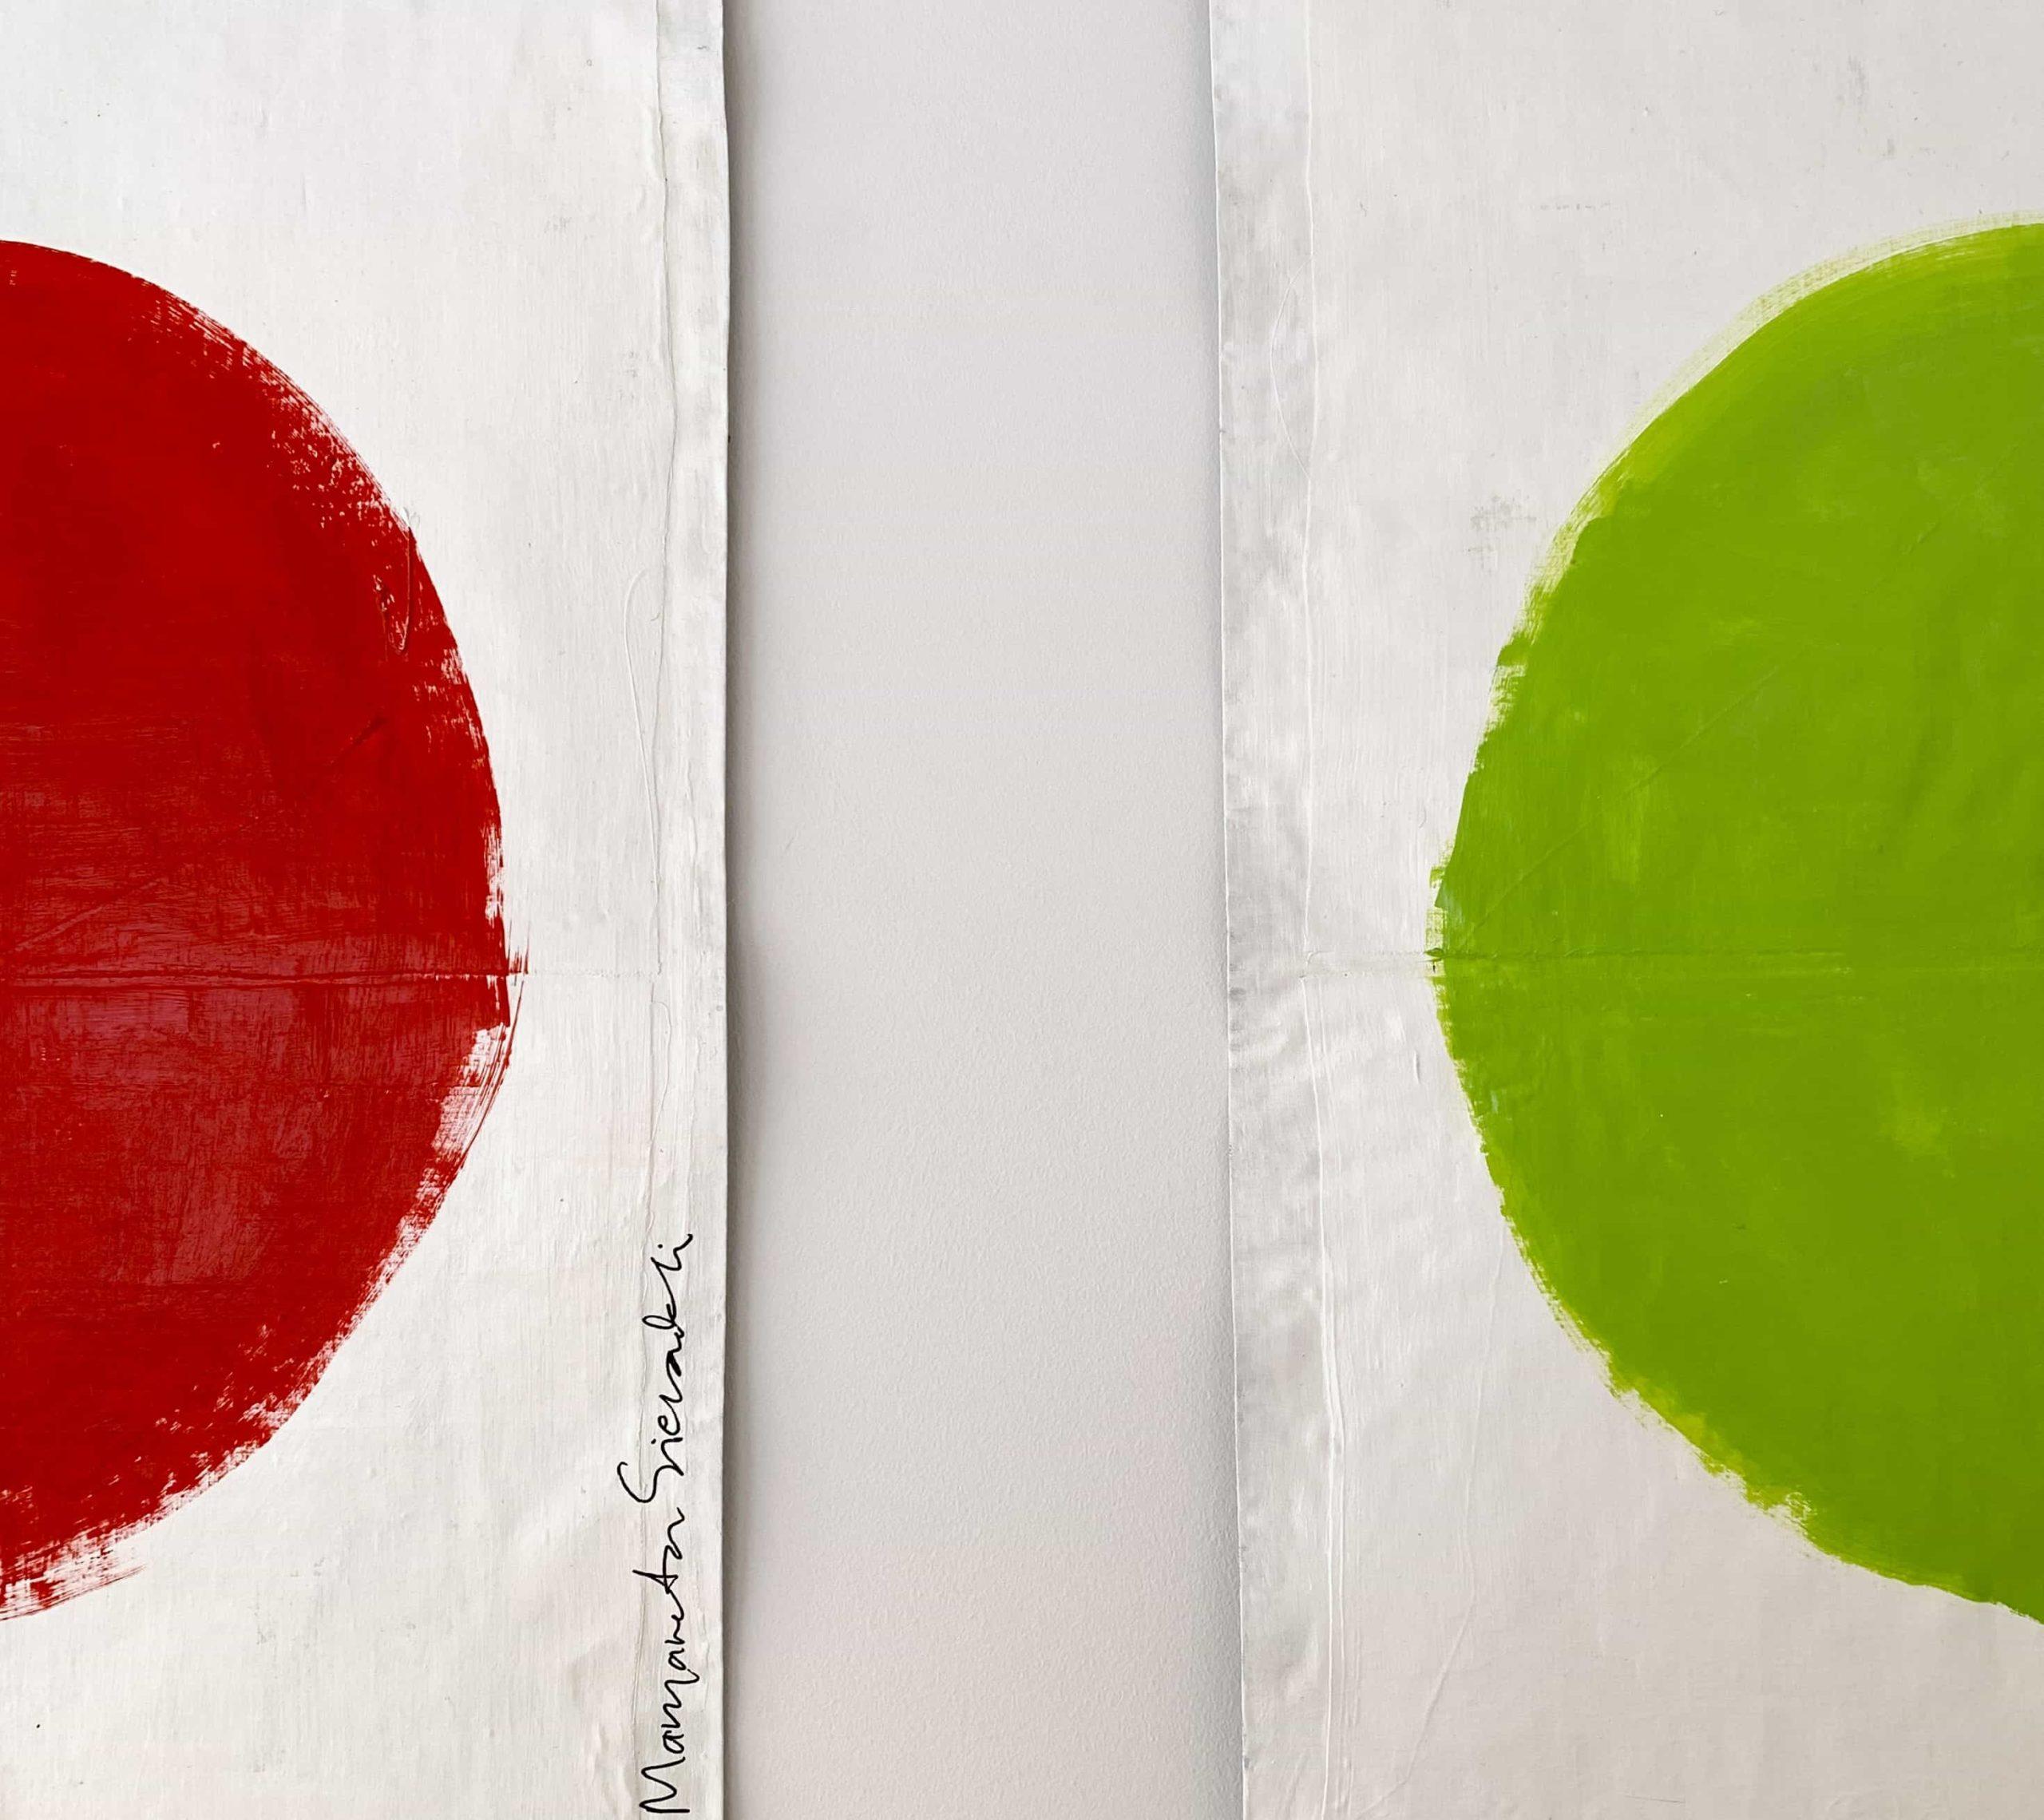 Röd o Grön i fokus